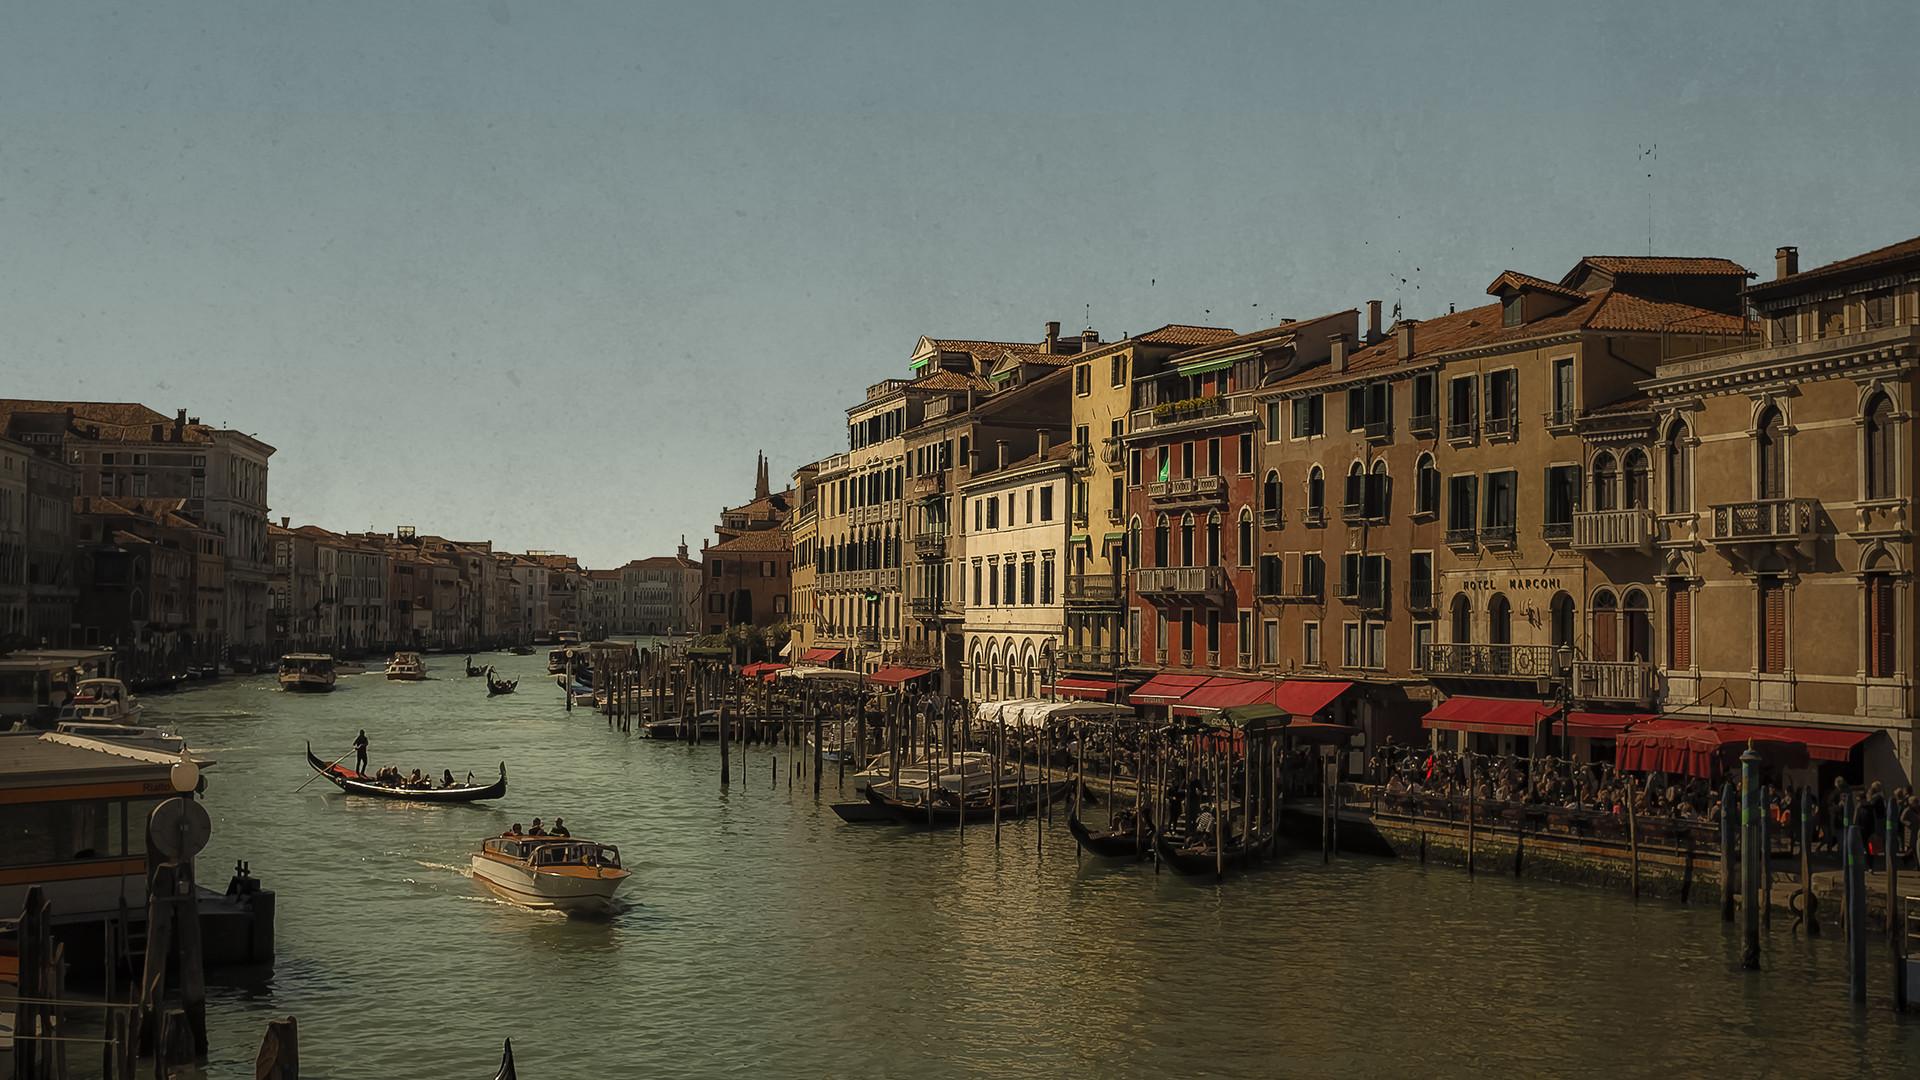 Canal from the Realto Bridge